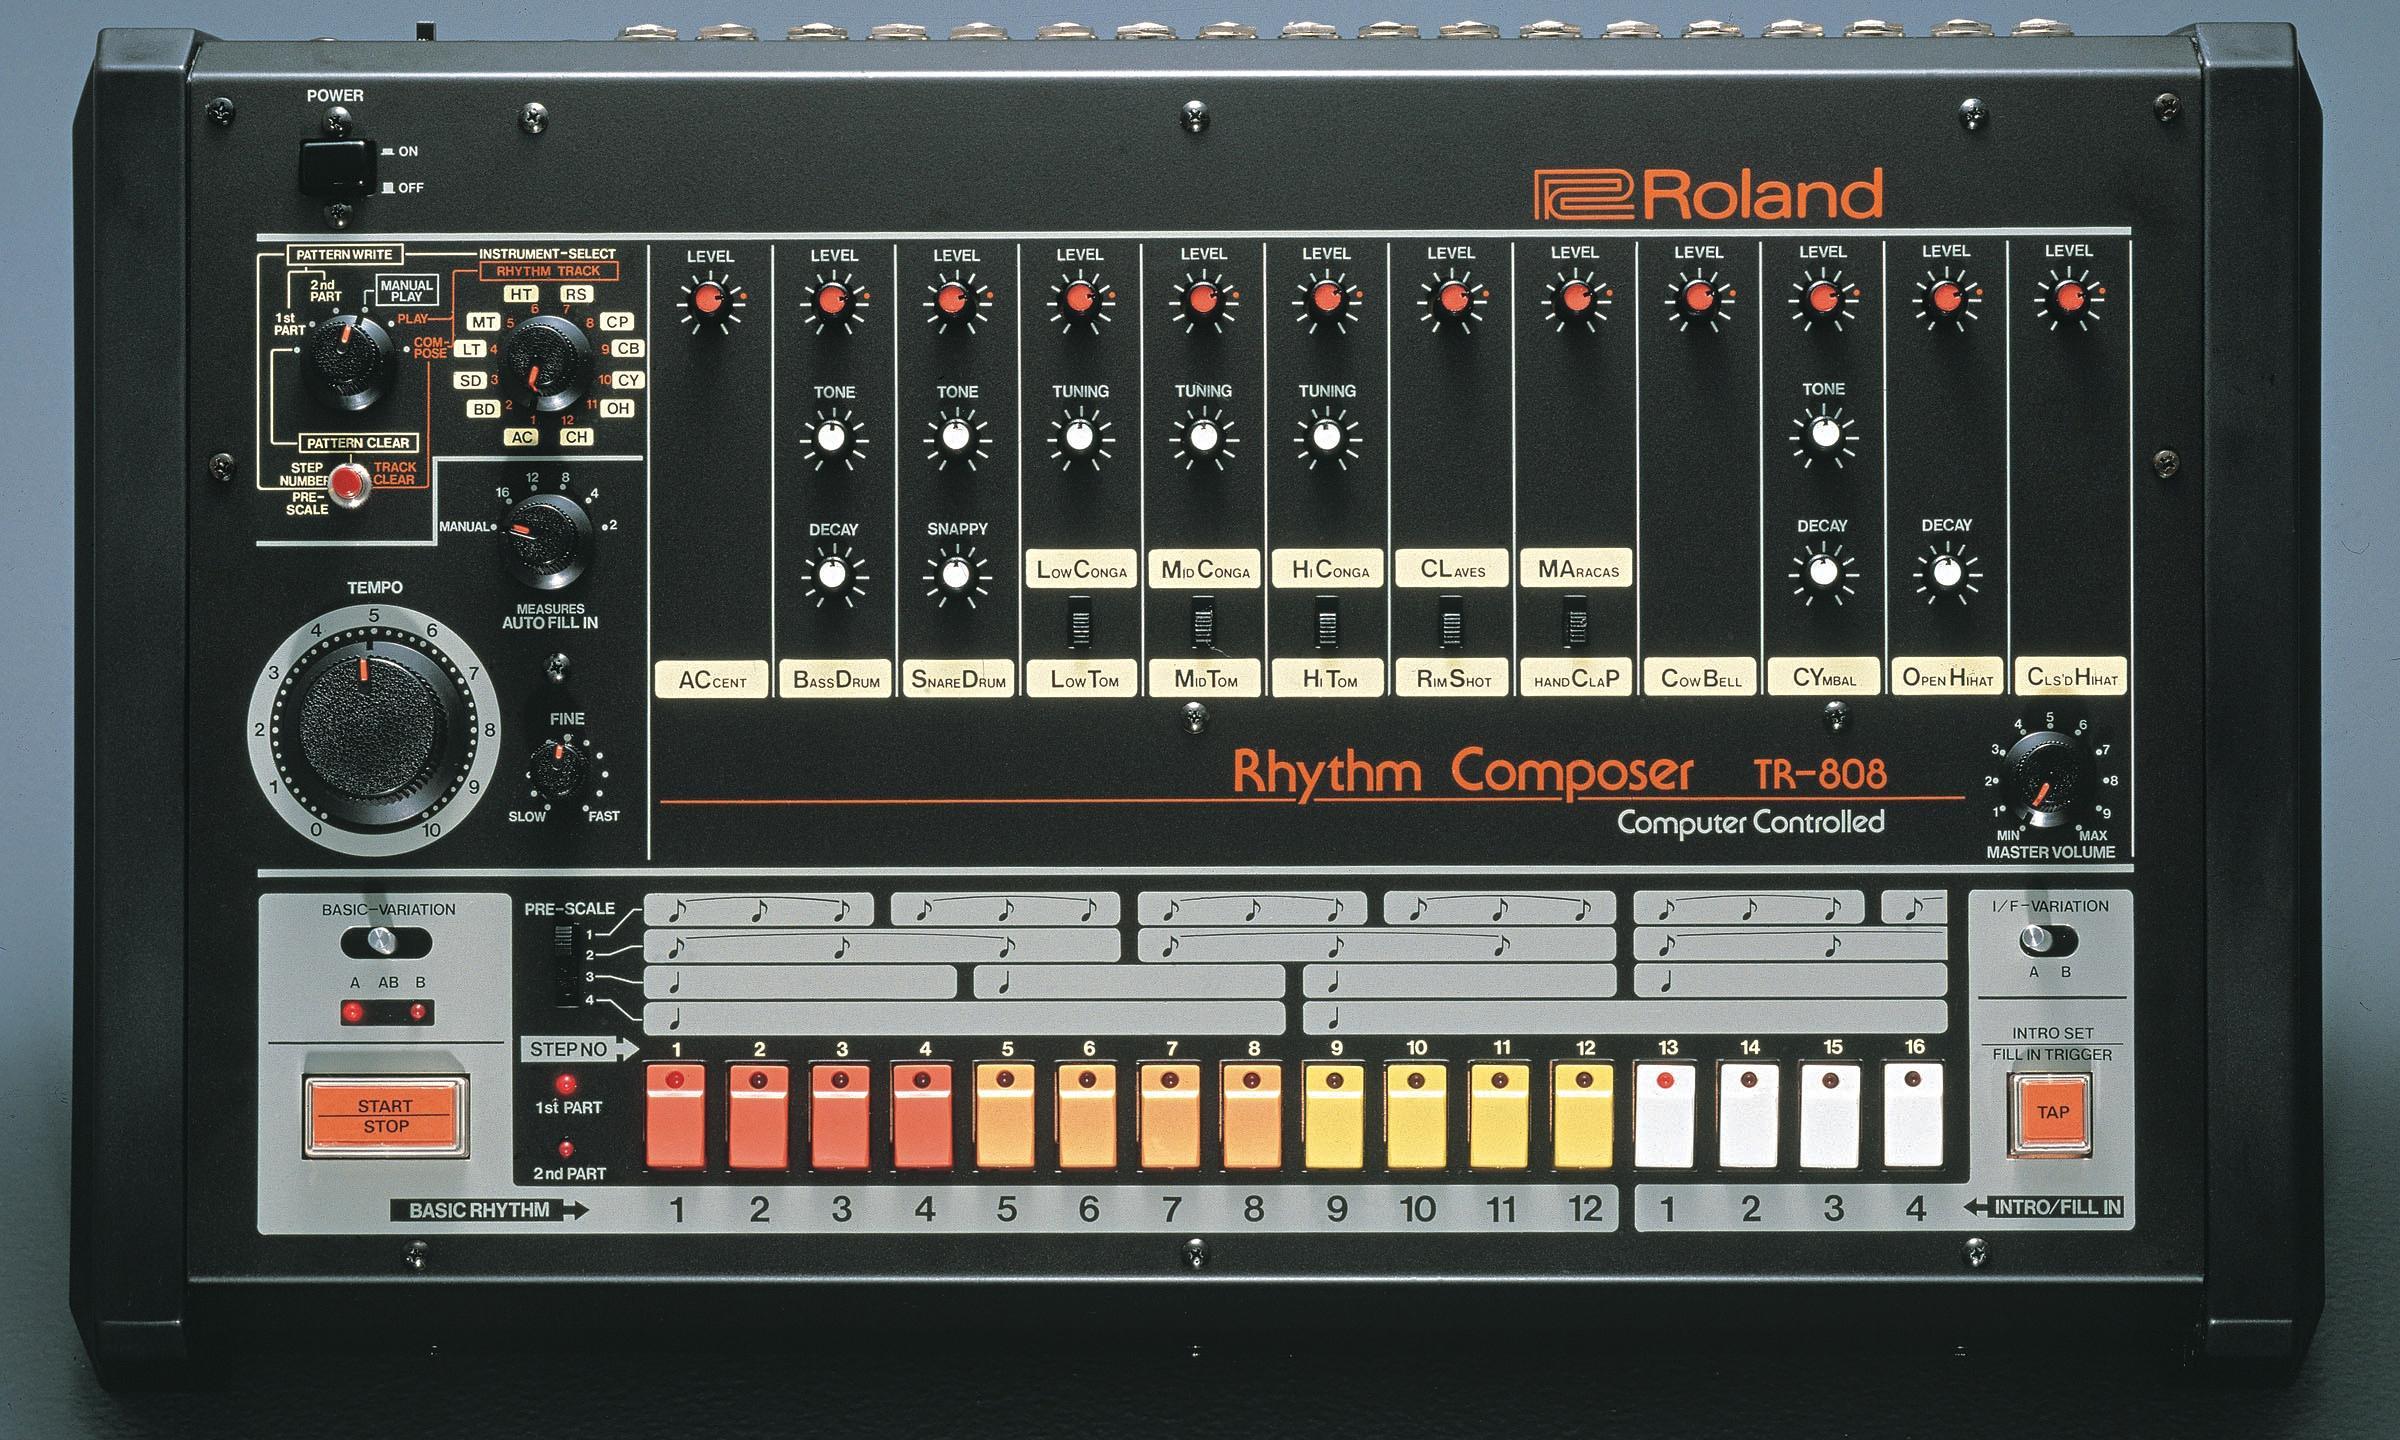 Drum Machine 808